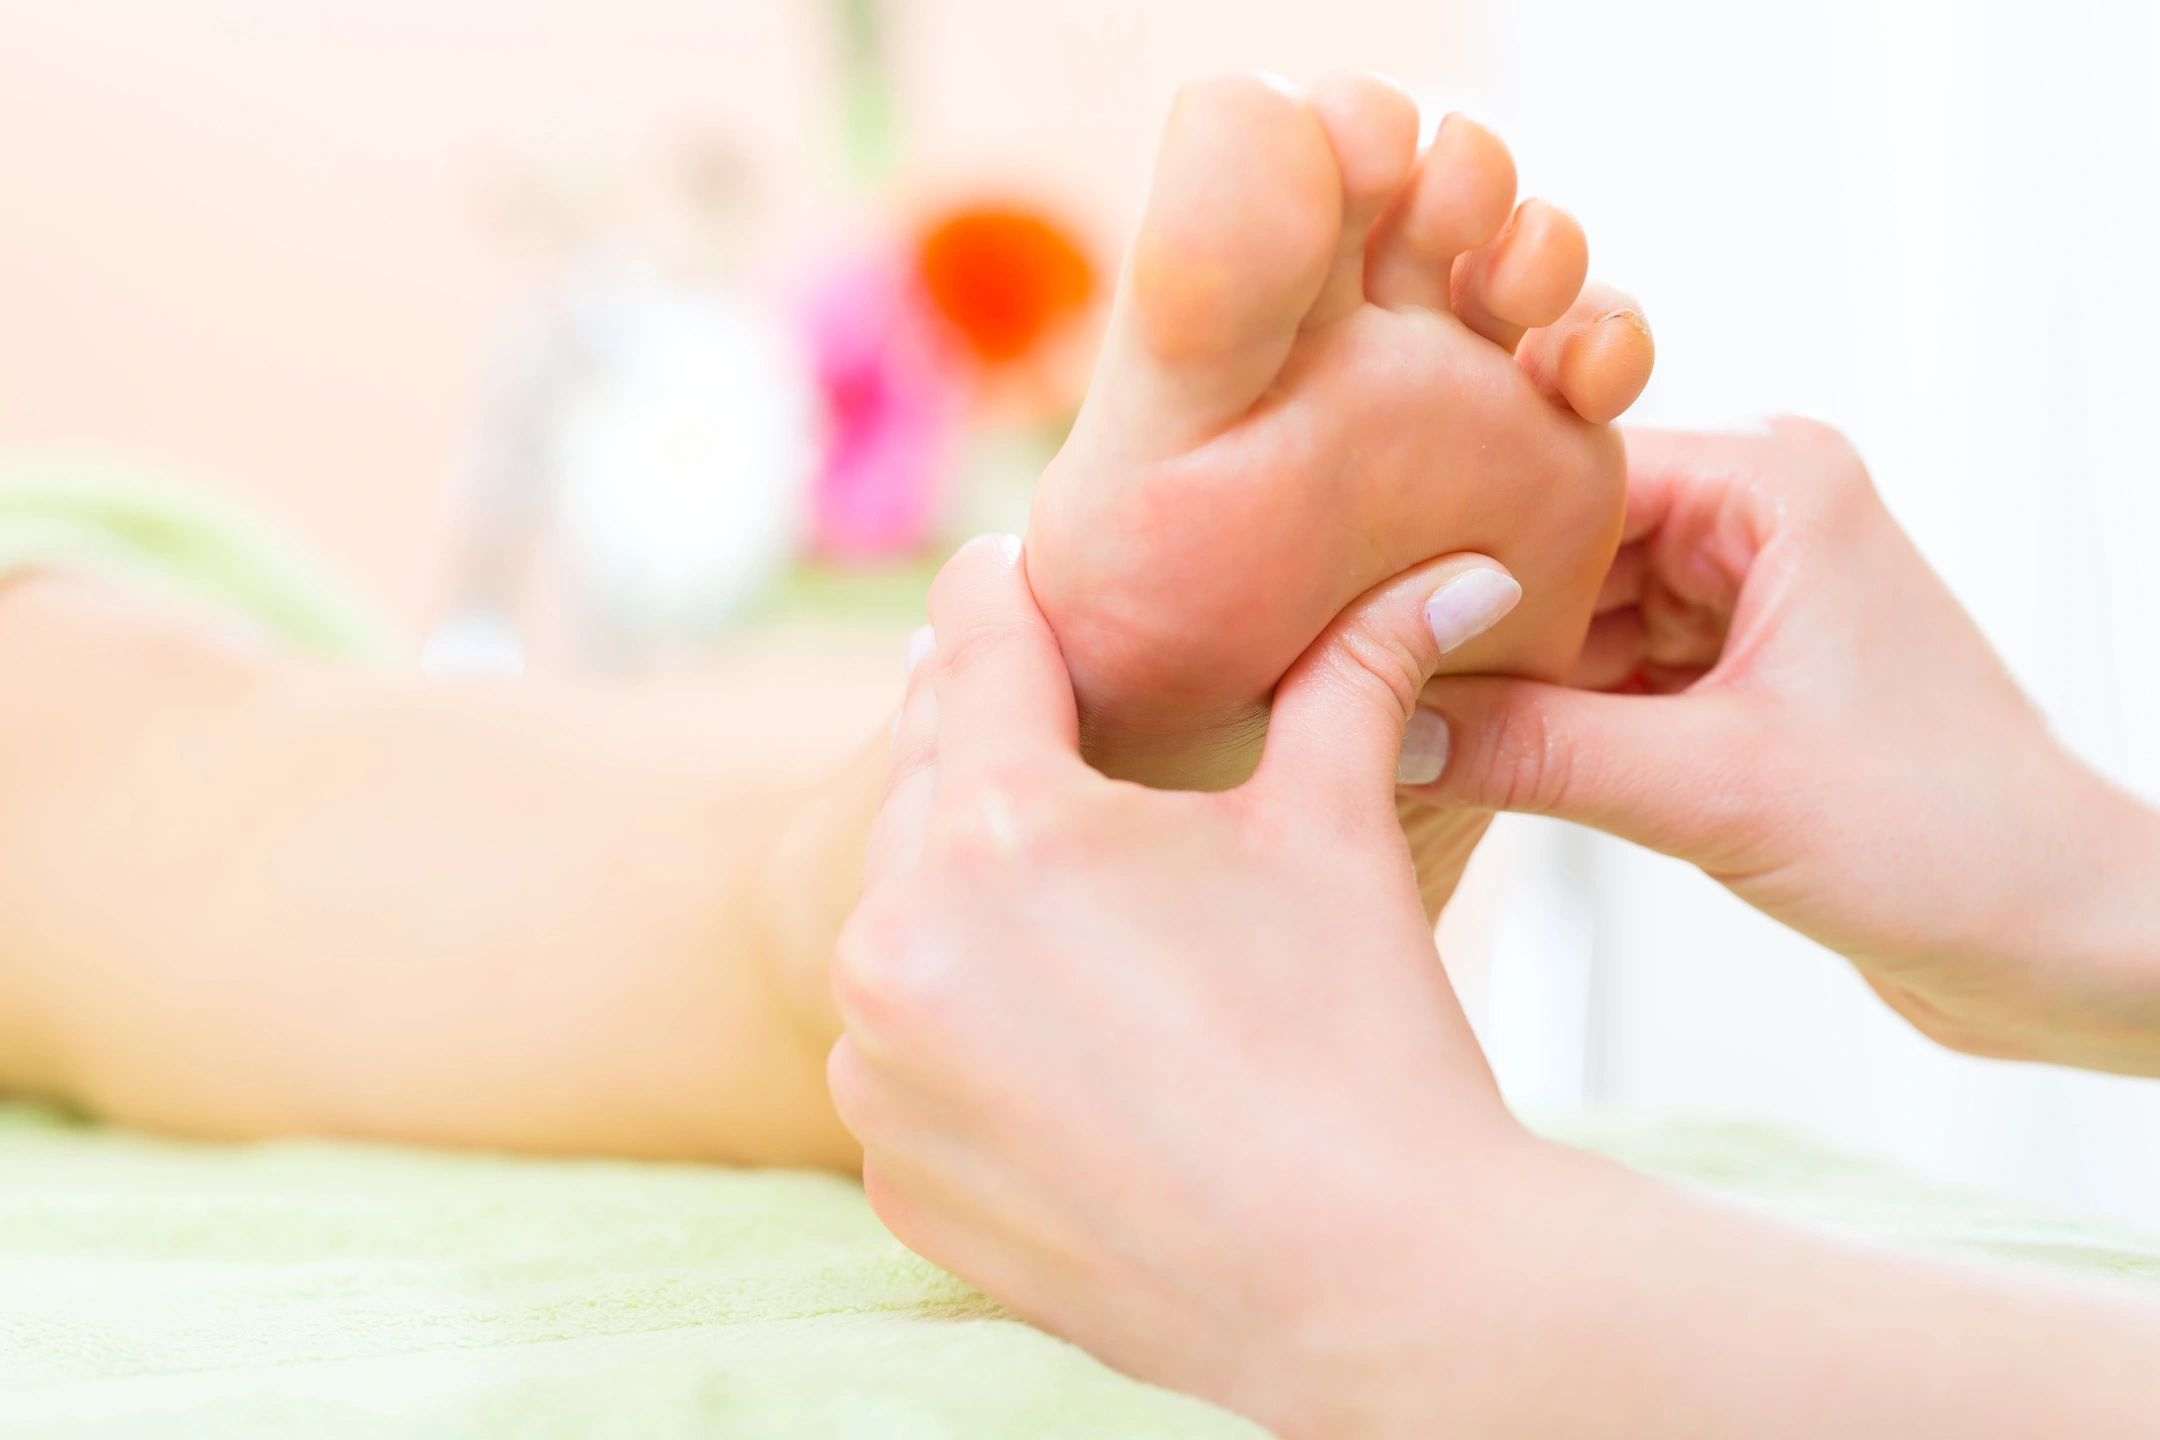 Reflexology on the foot